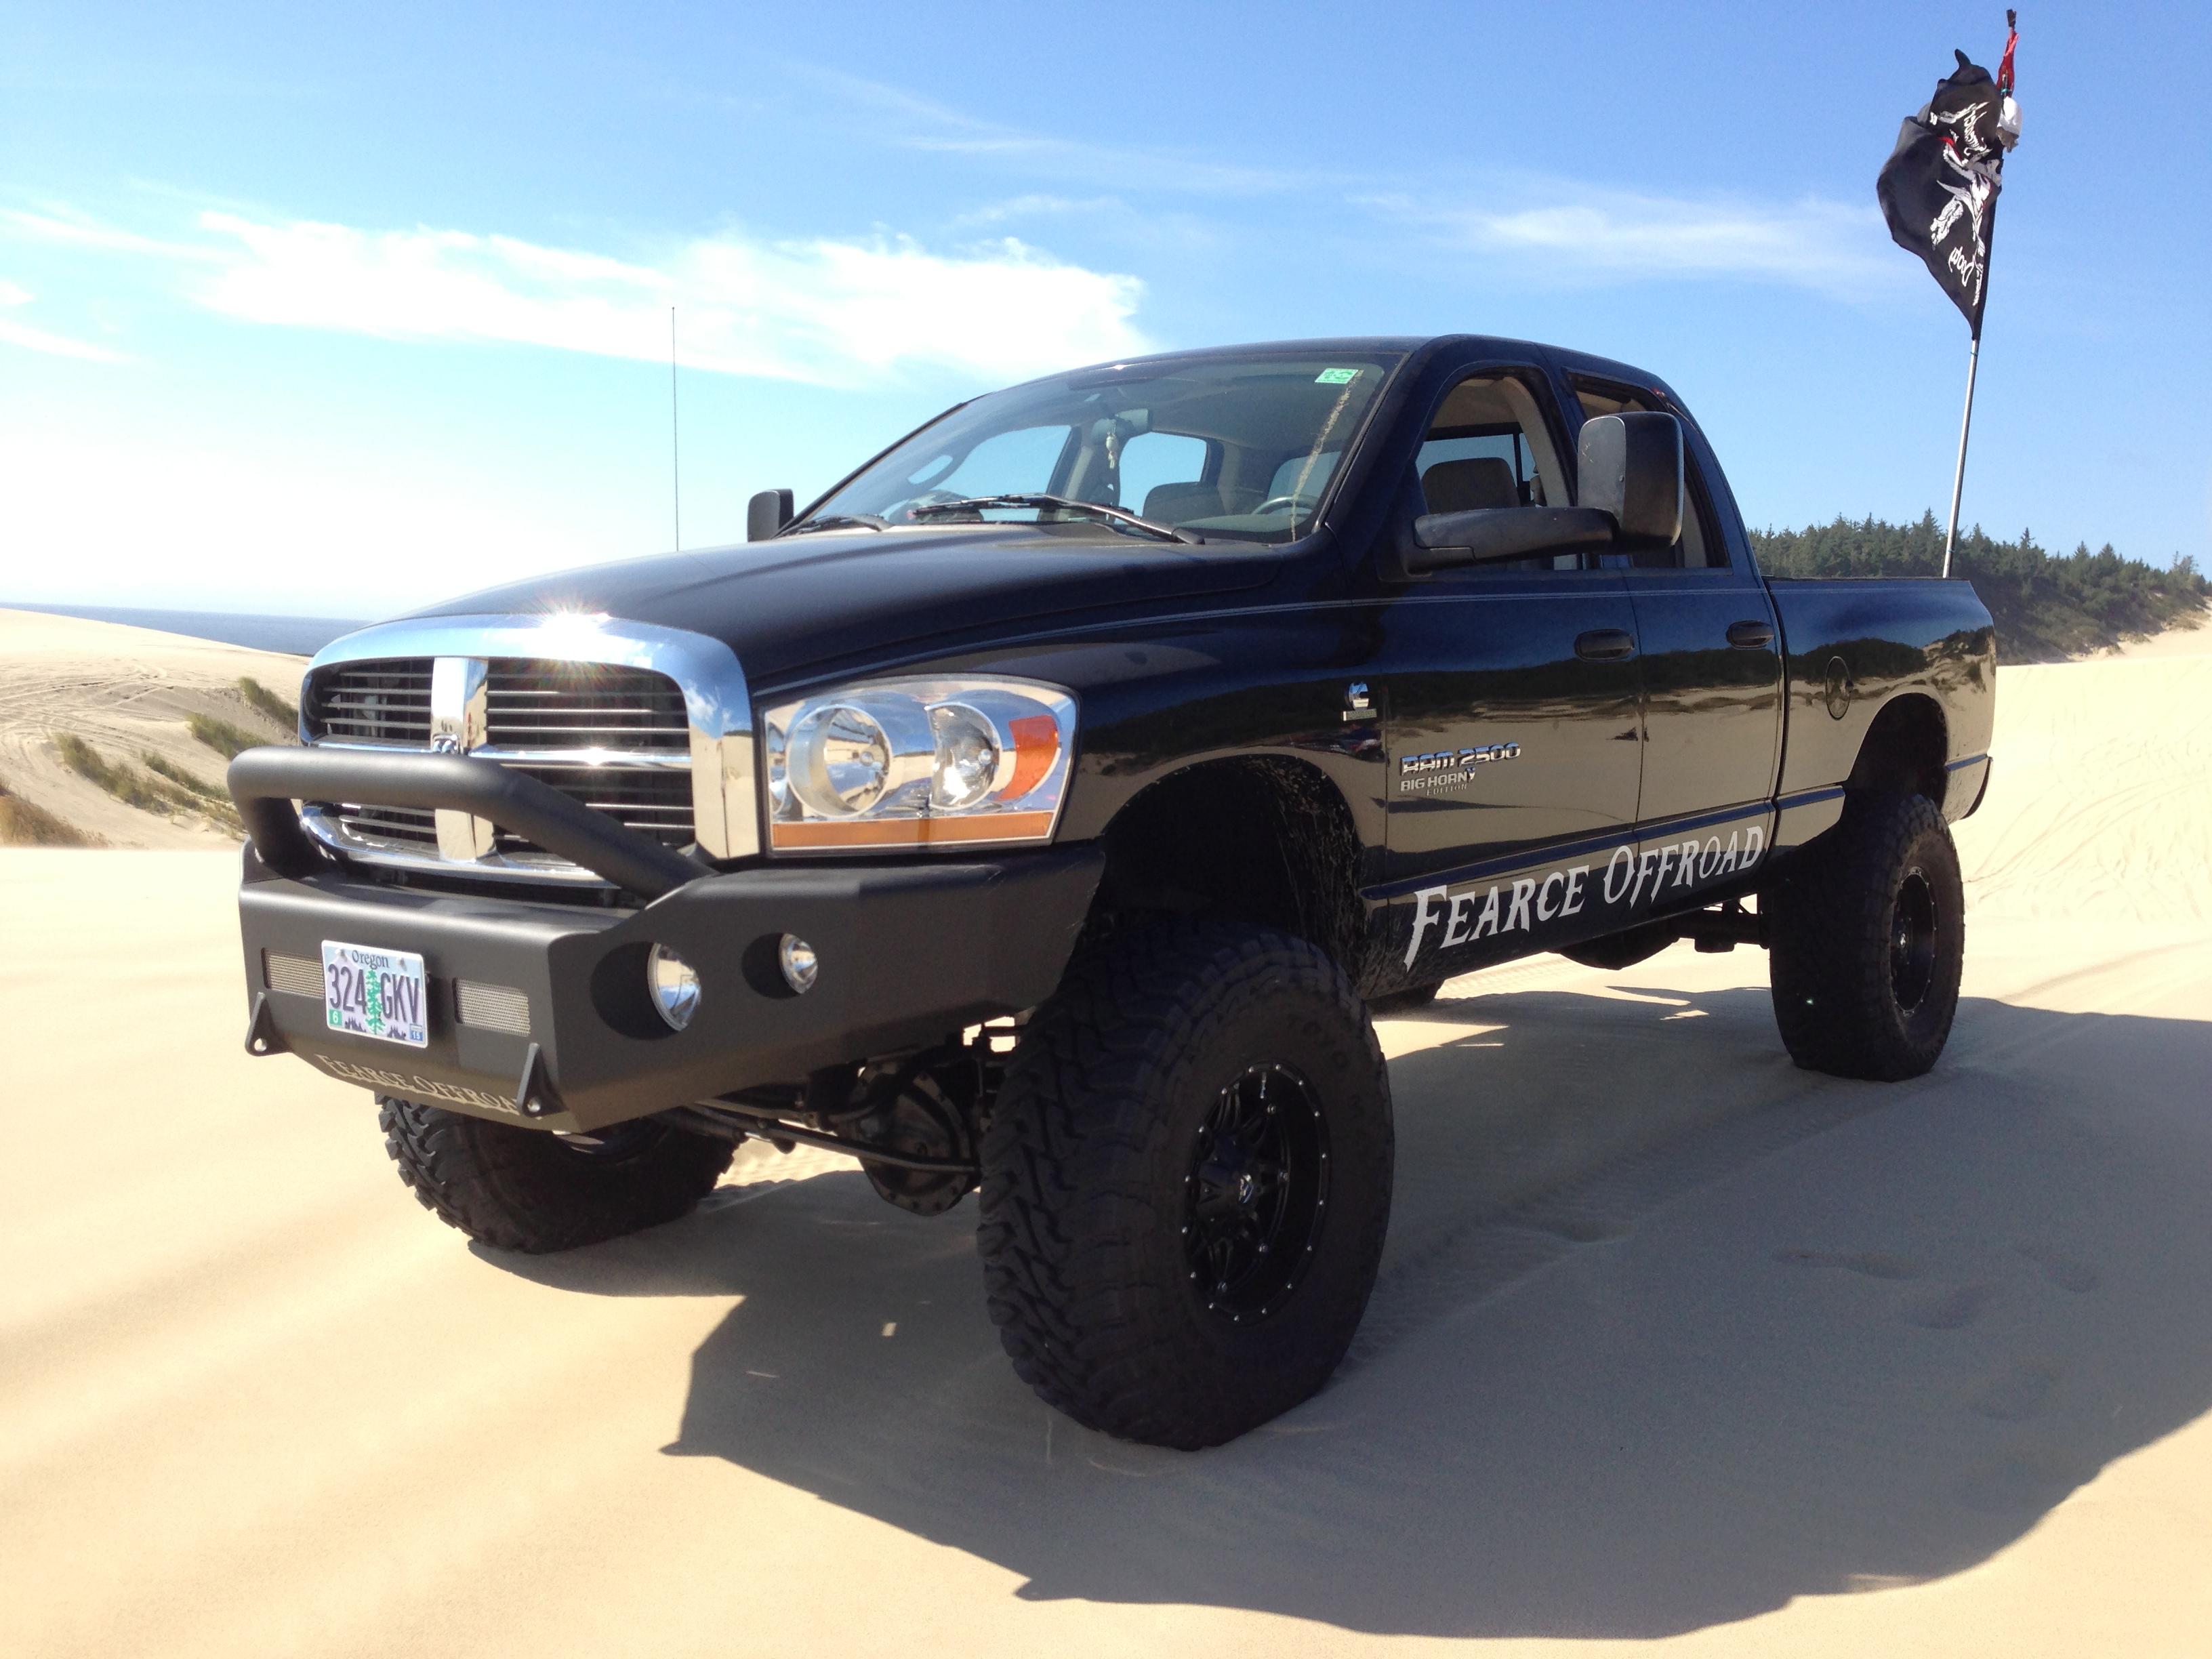 Fender Flares Dodge Ram 2500 >> Fearce Offroad-Custom Offroad Bumpers for Trucks